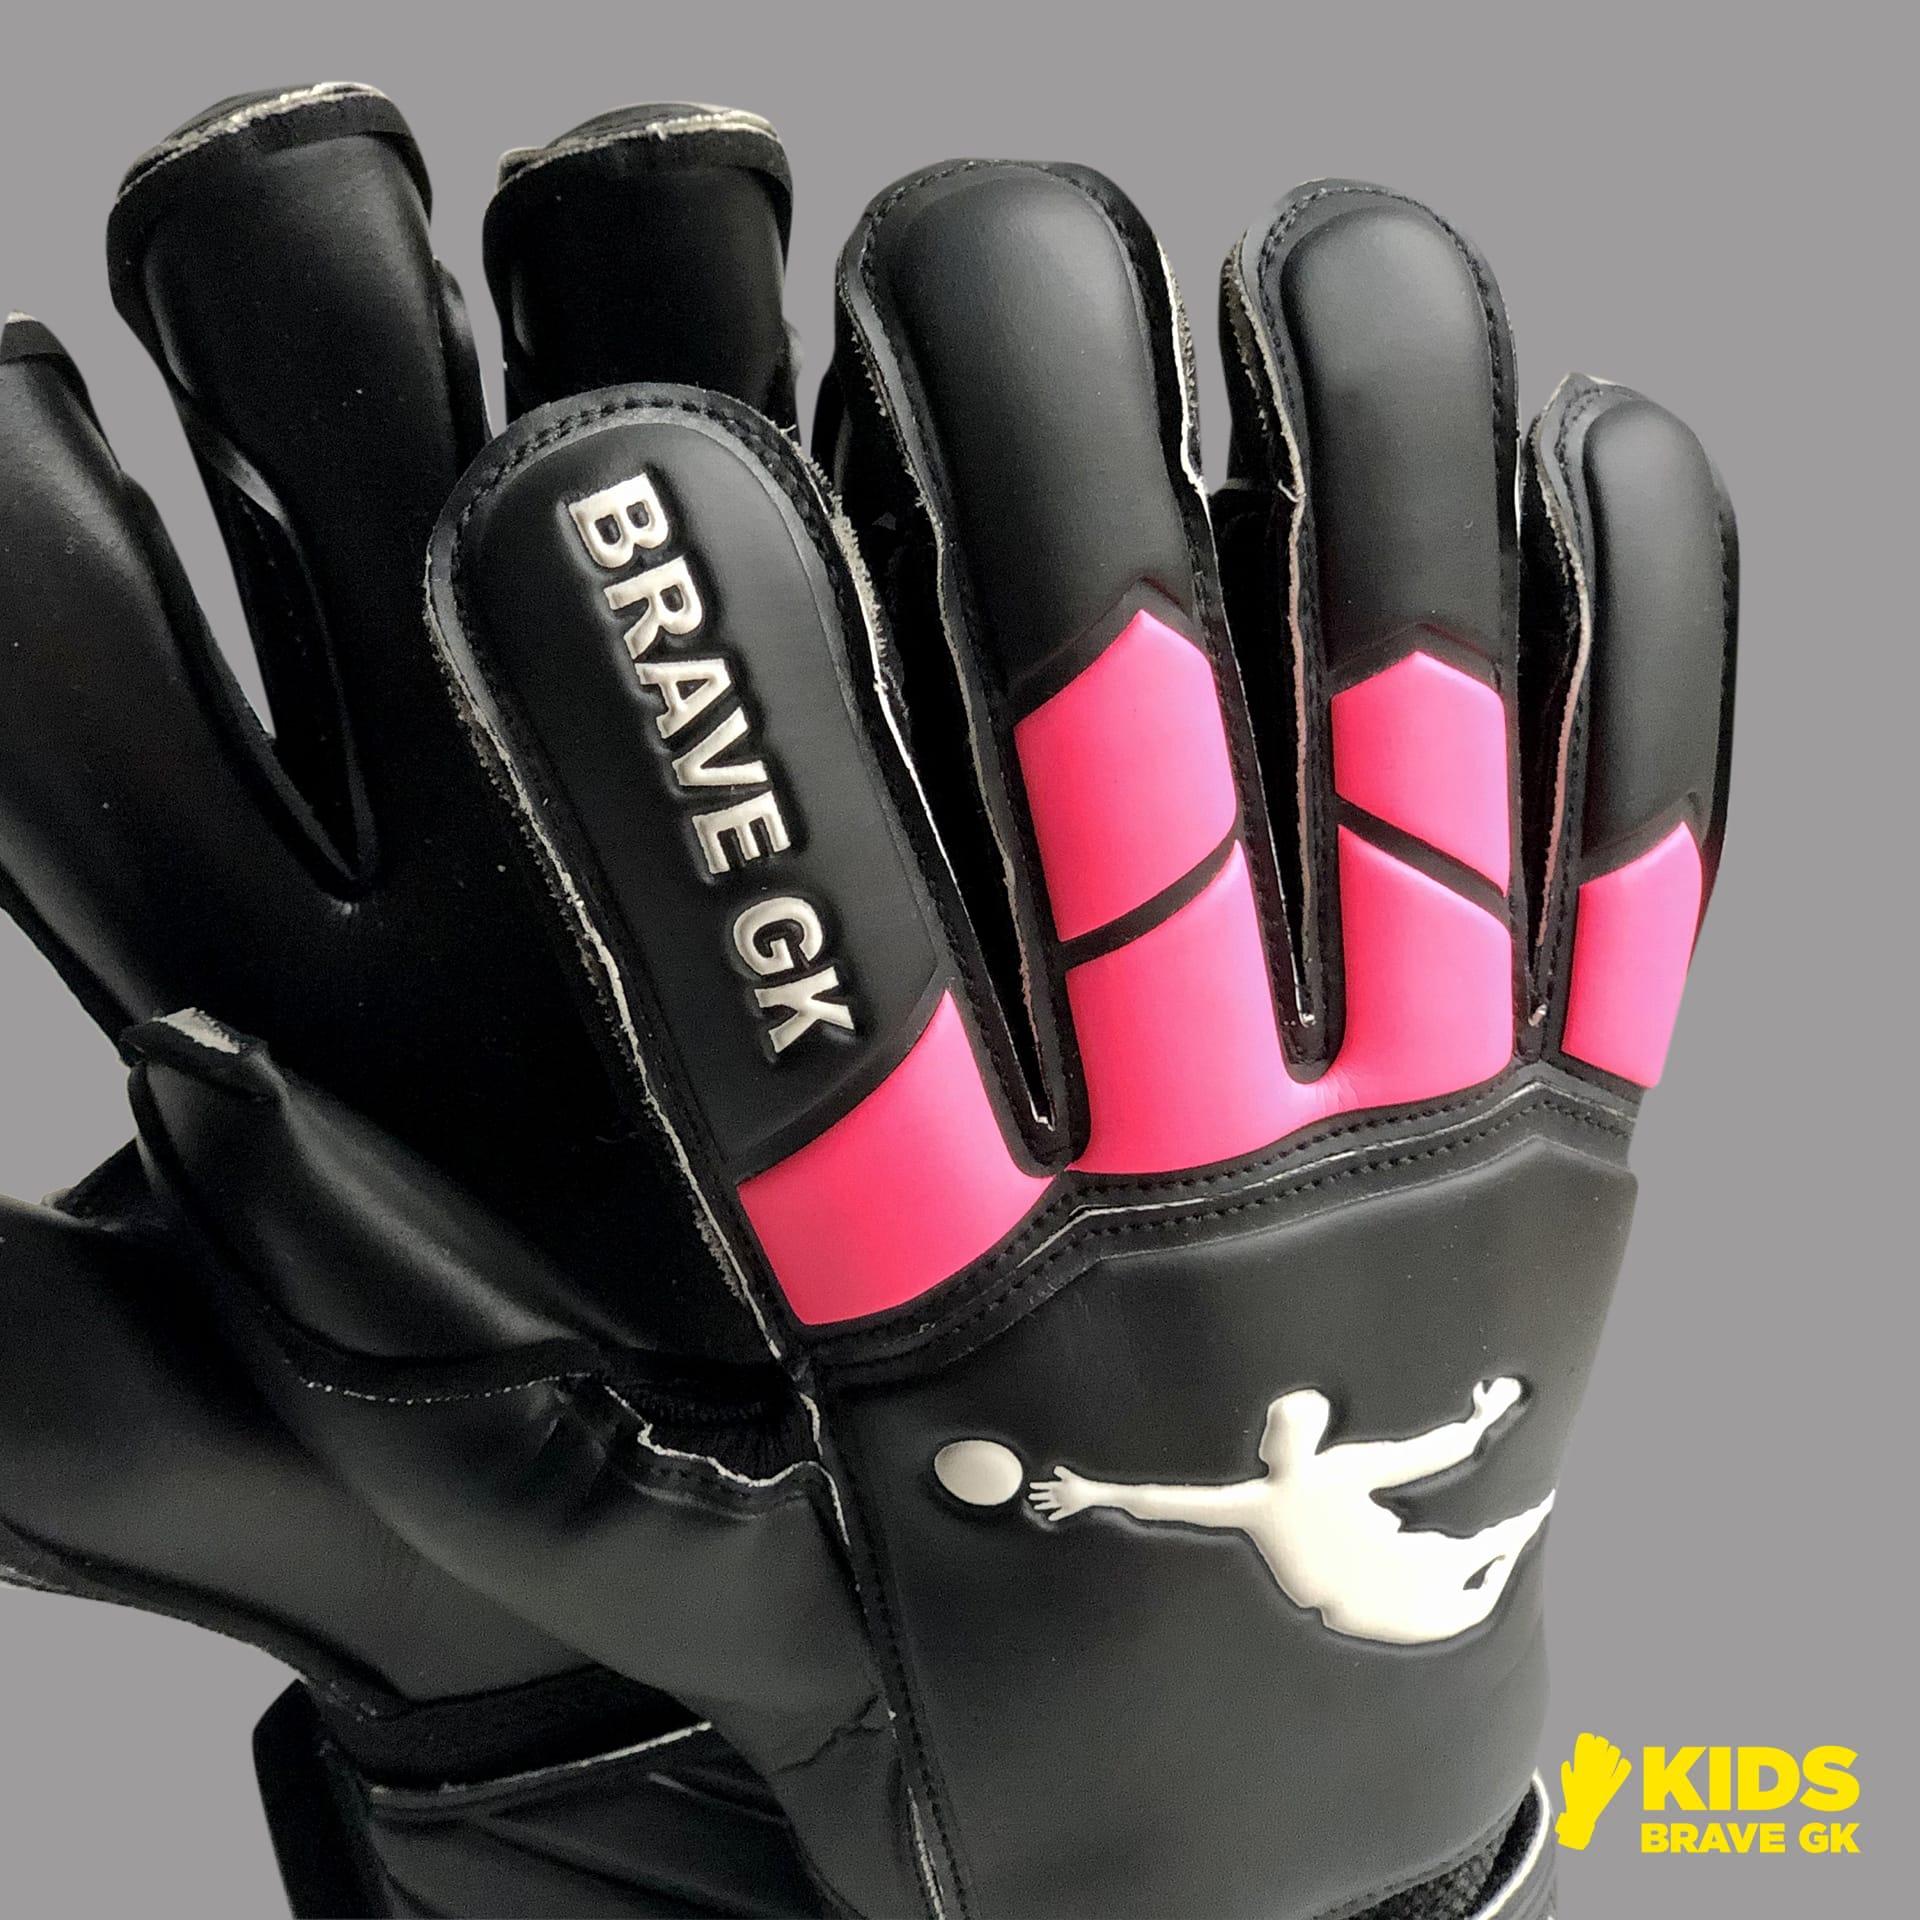 Перчатки Brave GK Phantome Pink -  интернет-магазин Brave GK